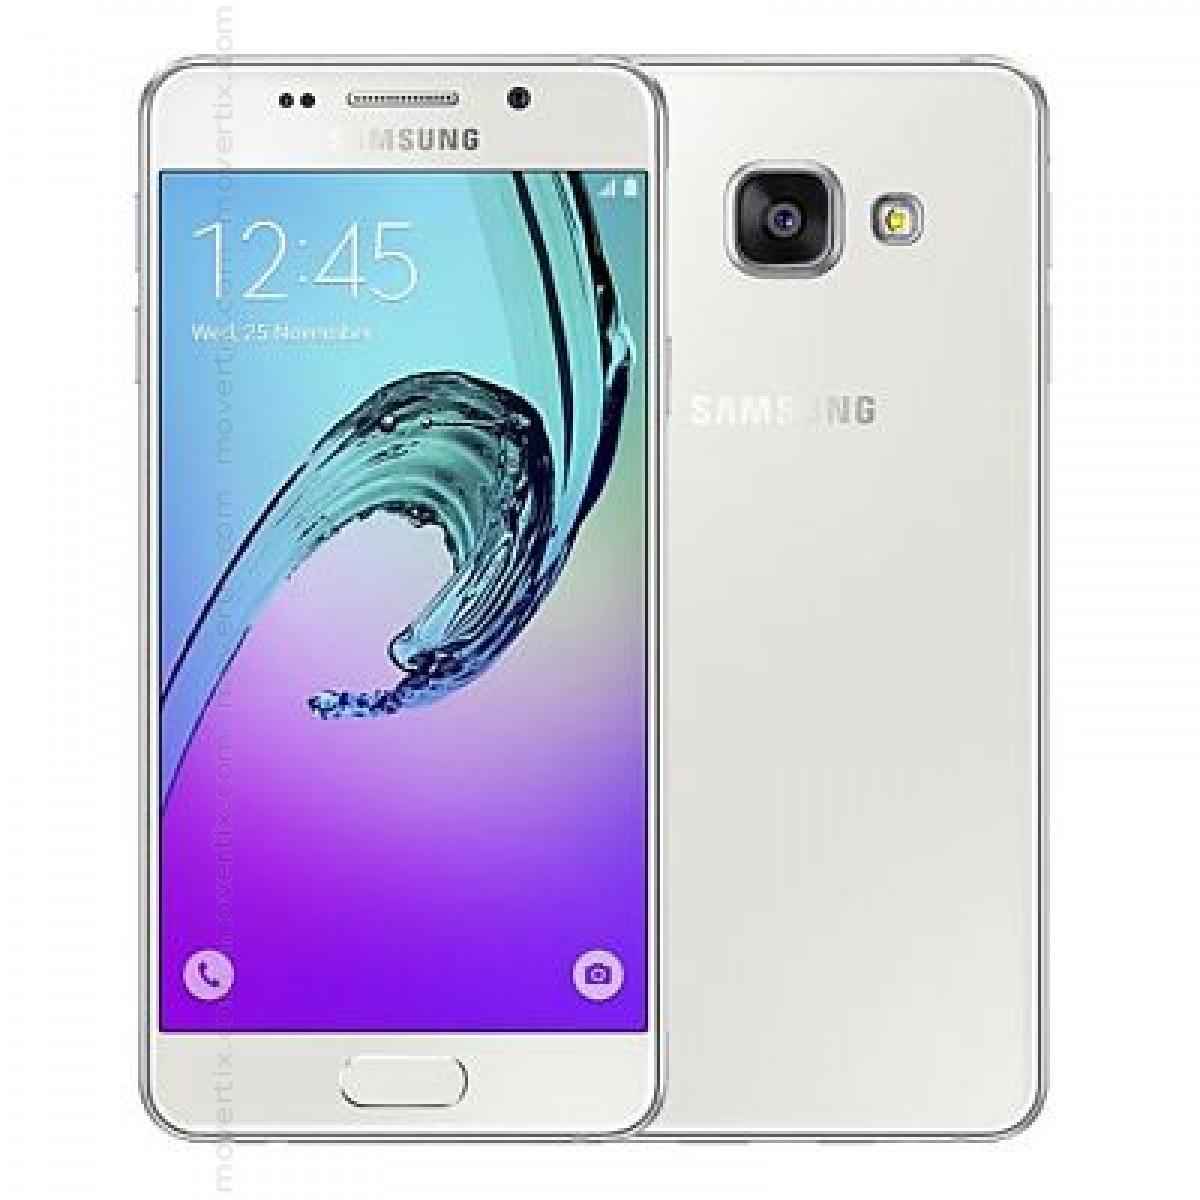 samsung galaxy a5 2016 white a510f 8806088140964 movertix mobile phones shop. Black Bedroom Furniture Sets. Home Design Ideas